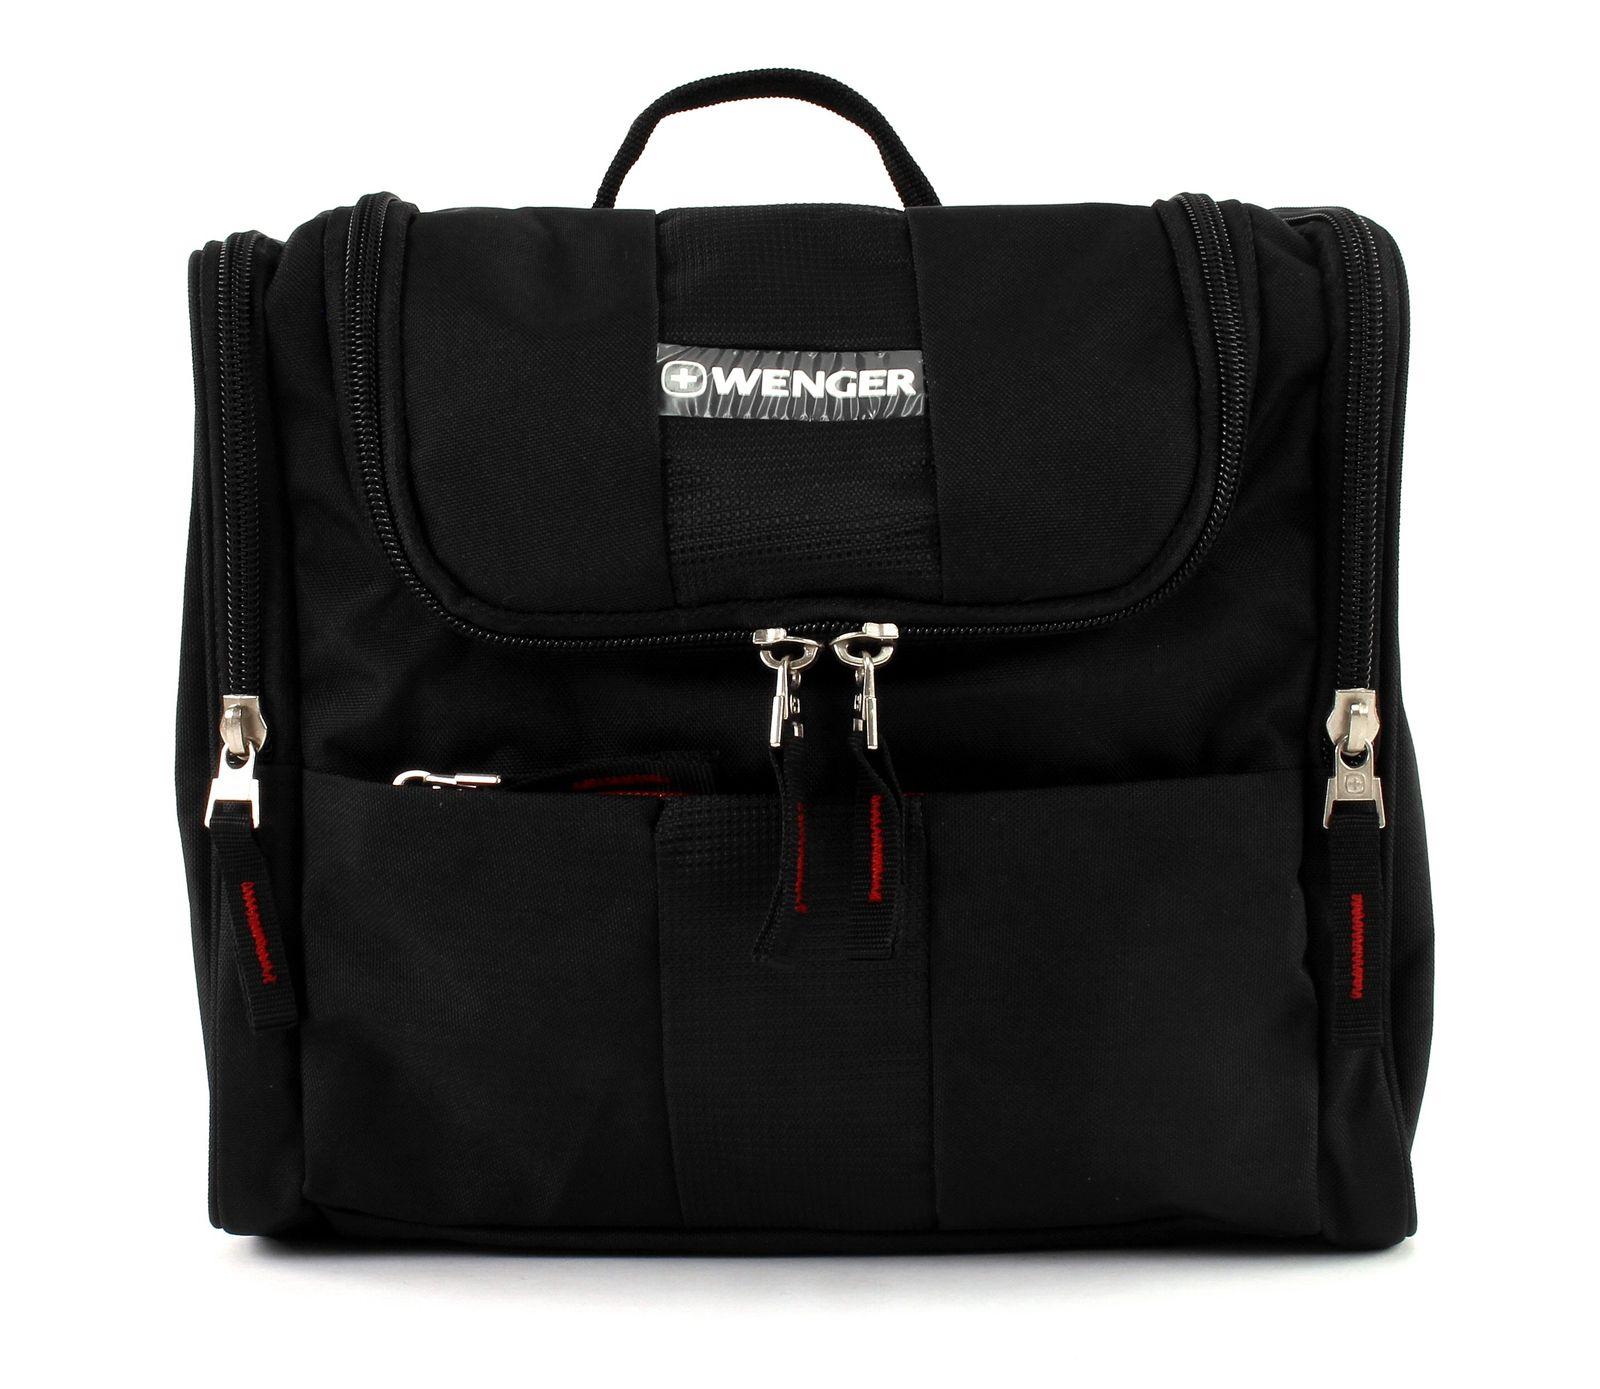 Wenger Toiletry Bags Toiletry Bag Sac de culture sac homme Noir black NEUF